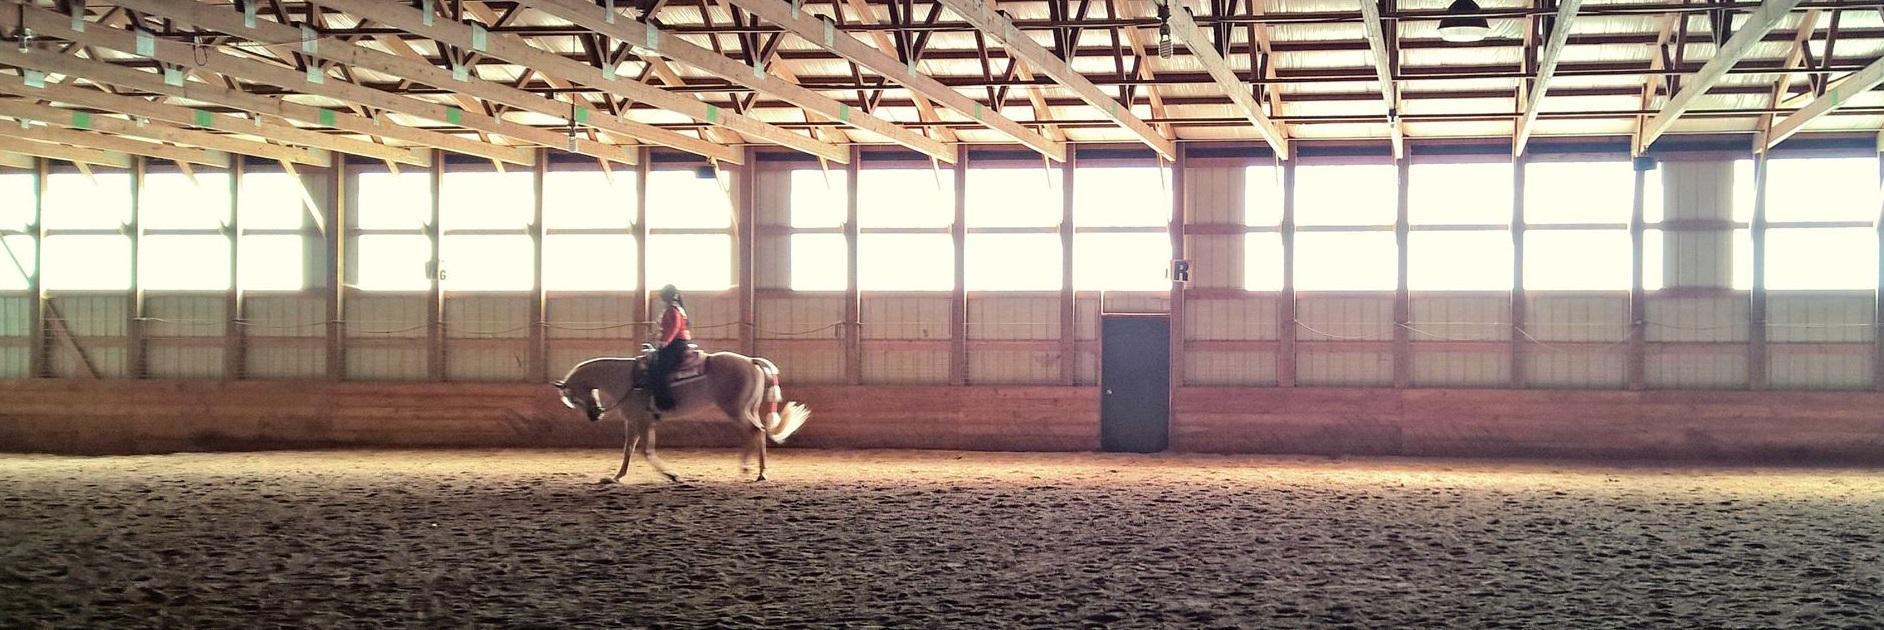 About   Heartland Equestrian Center